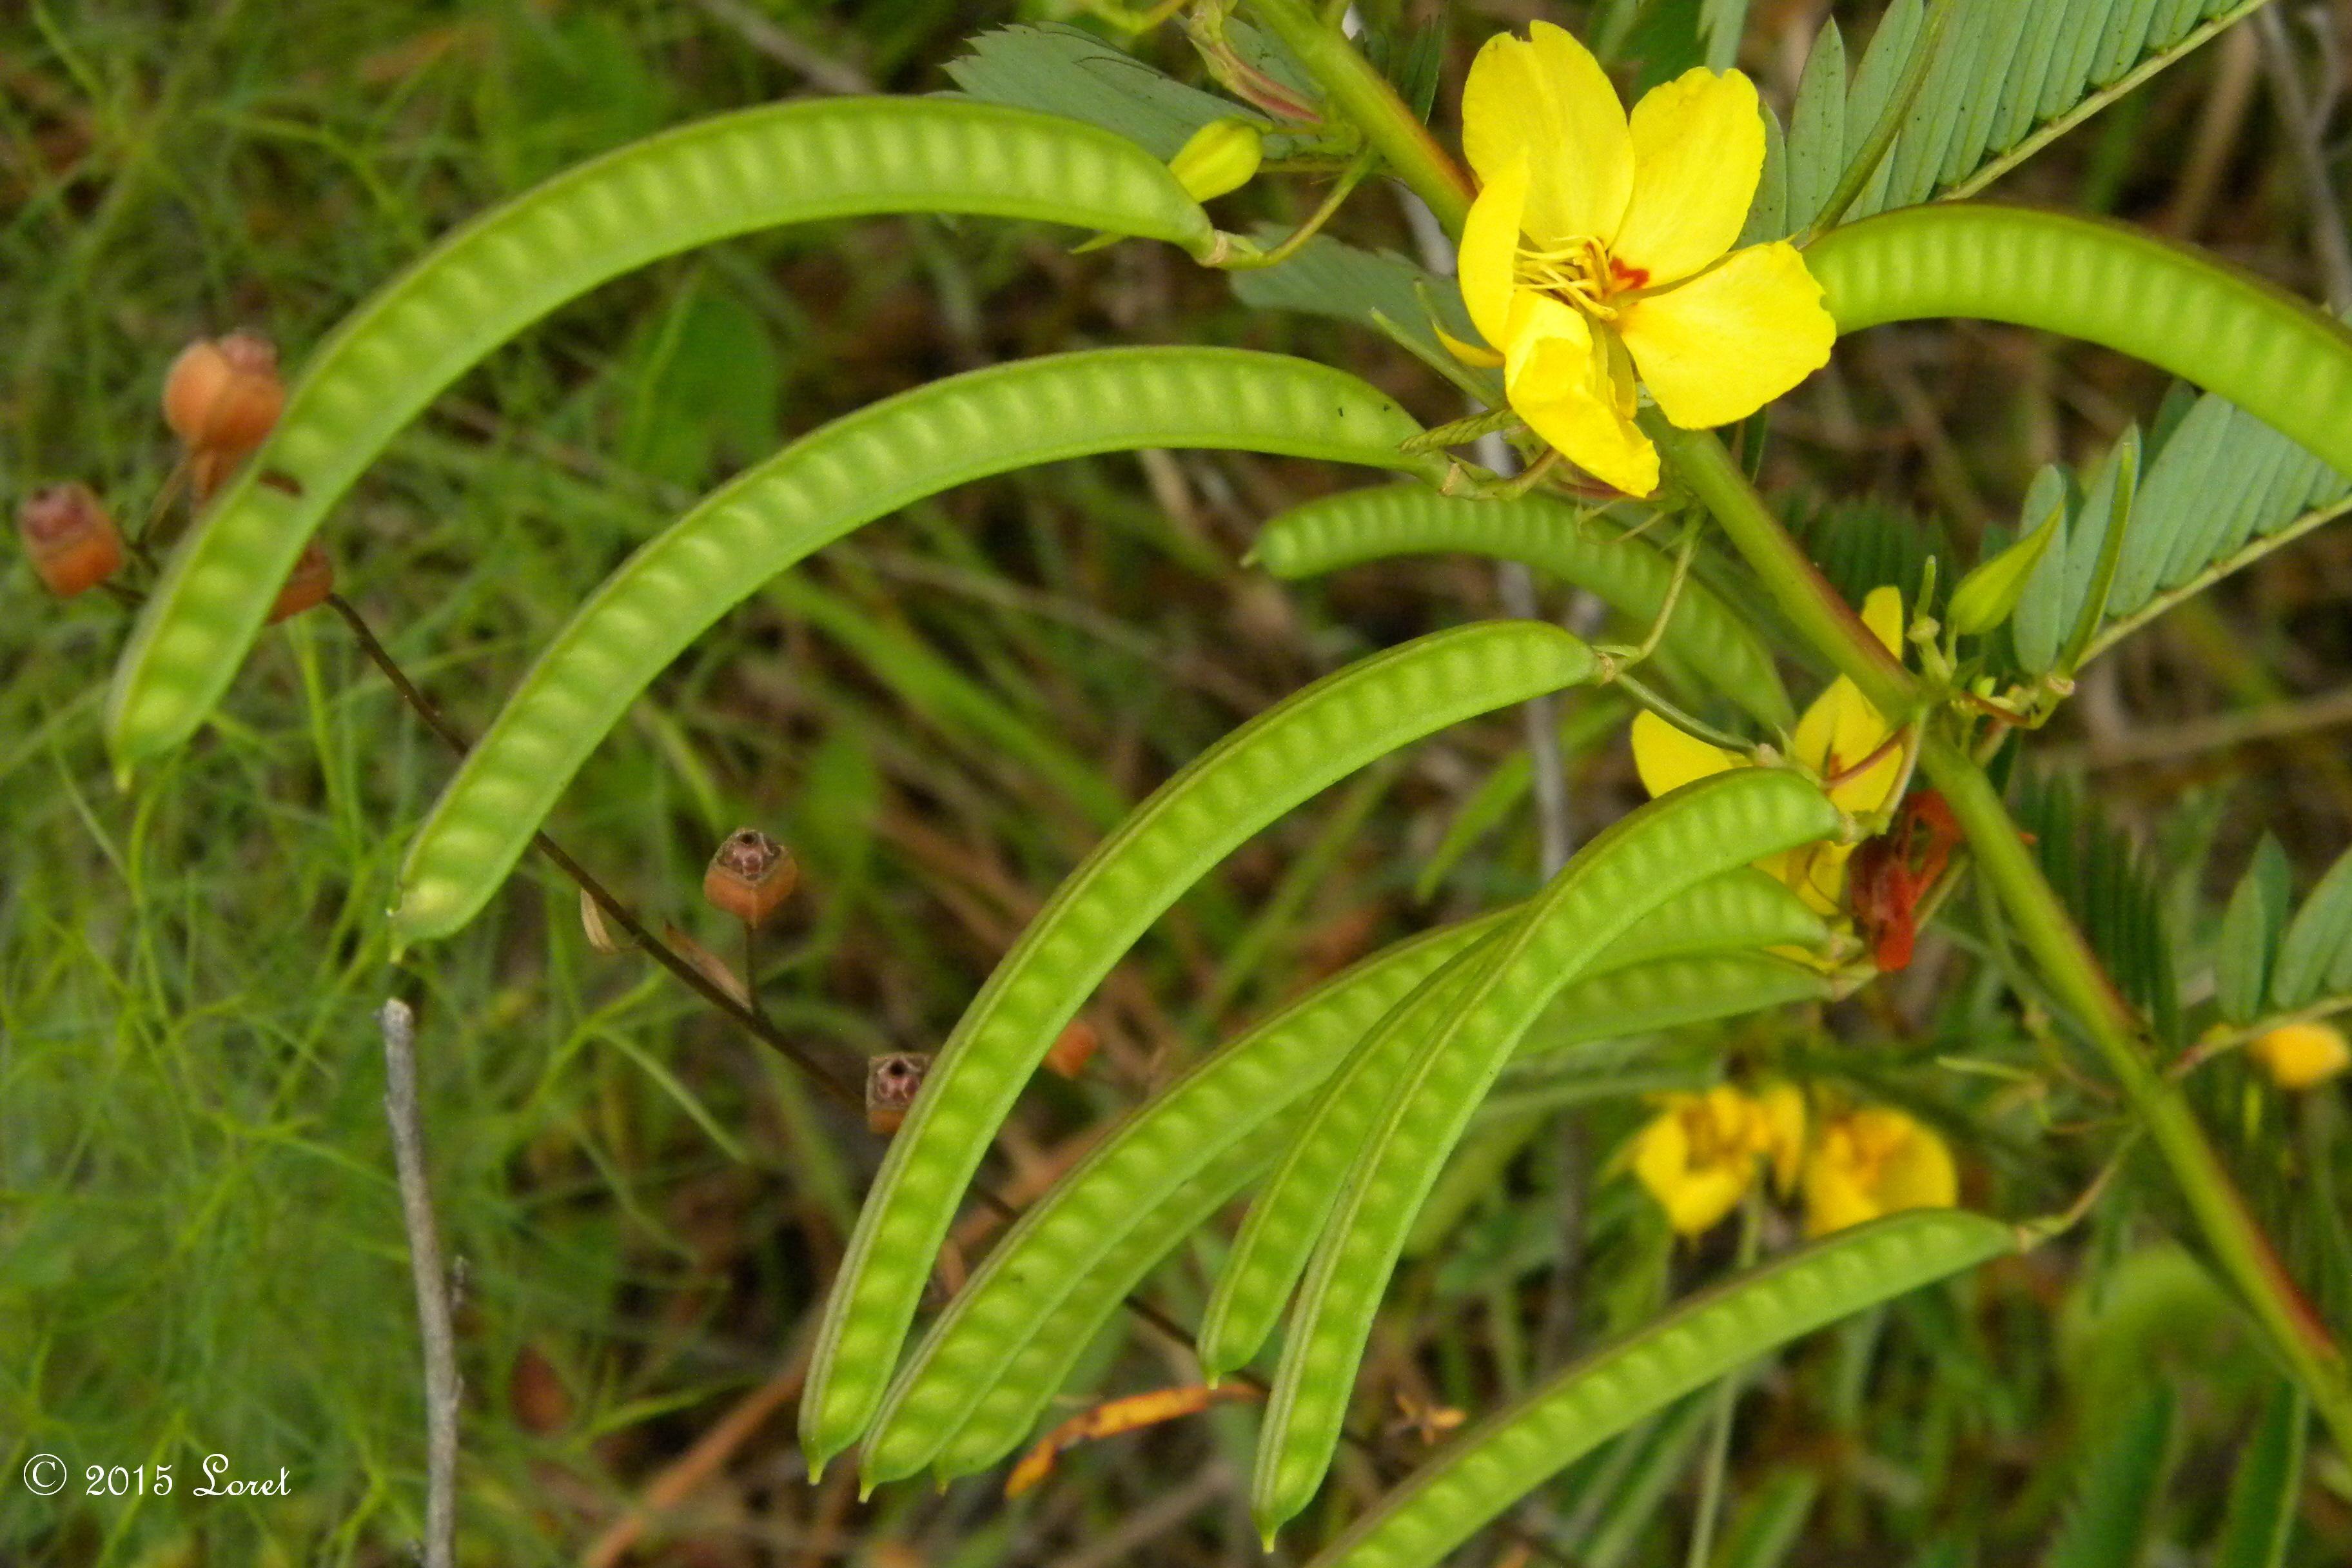 Friday Focus on Fruit: Florida Native Plant PARTRIDGE PEA (Chamaecrista fasciculata) More info, photos:0915